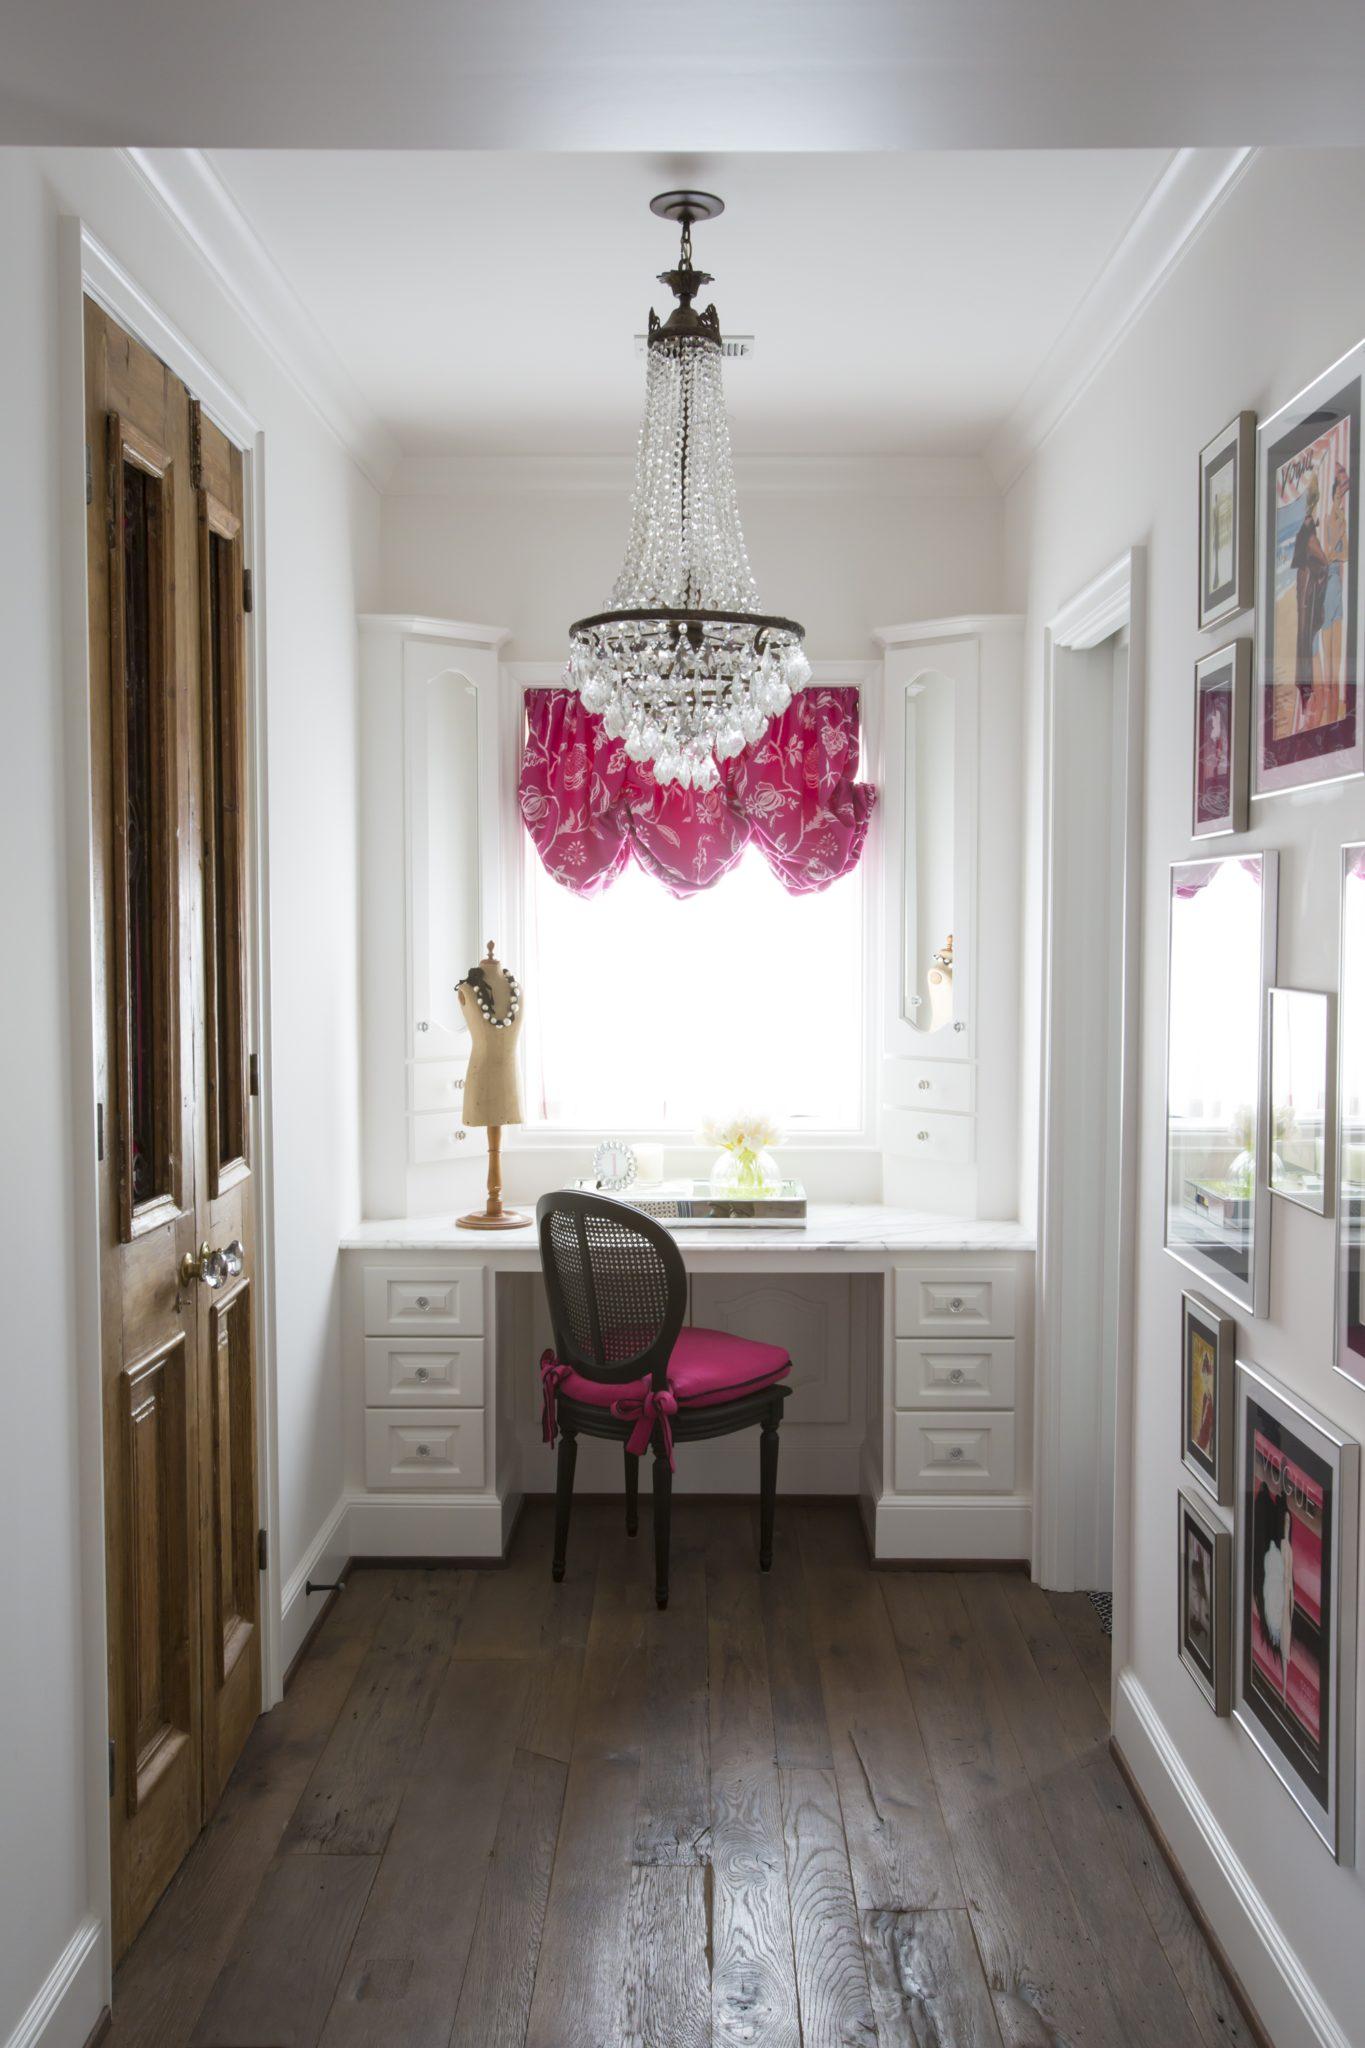 Girls vanity area inspired by Parisian fashion- reclaimed doors & bright fabrics by Triangle Interiors